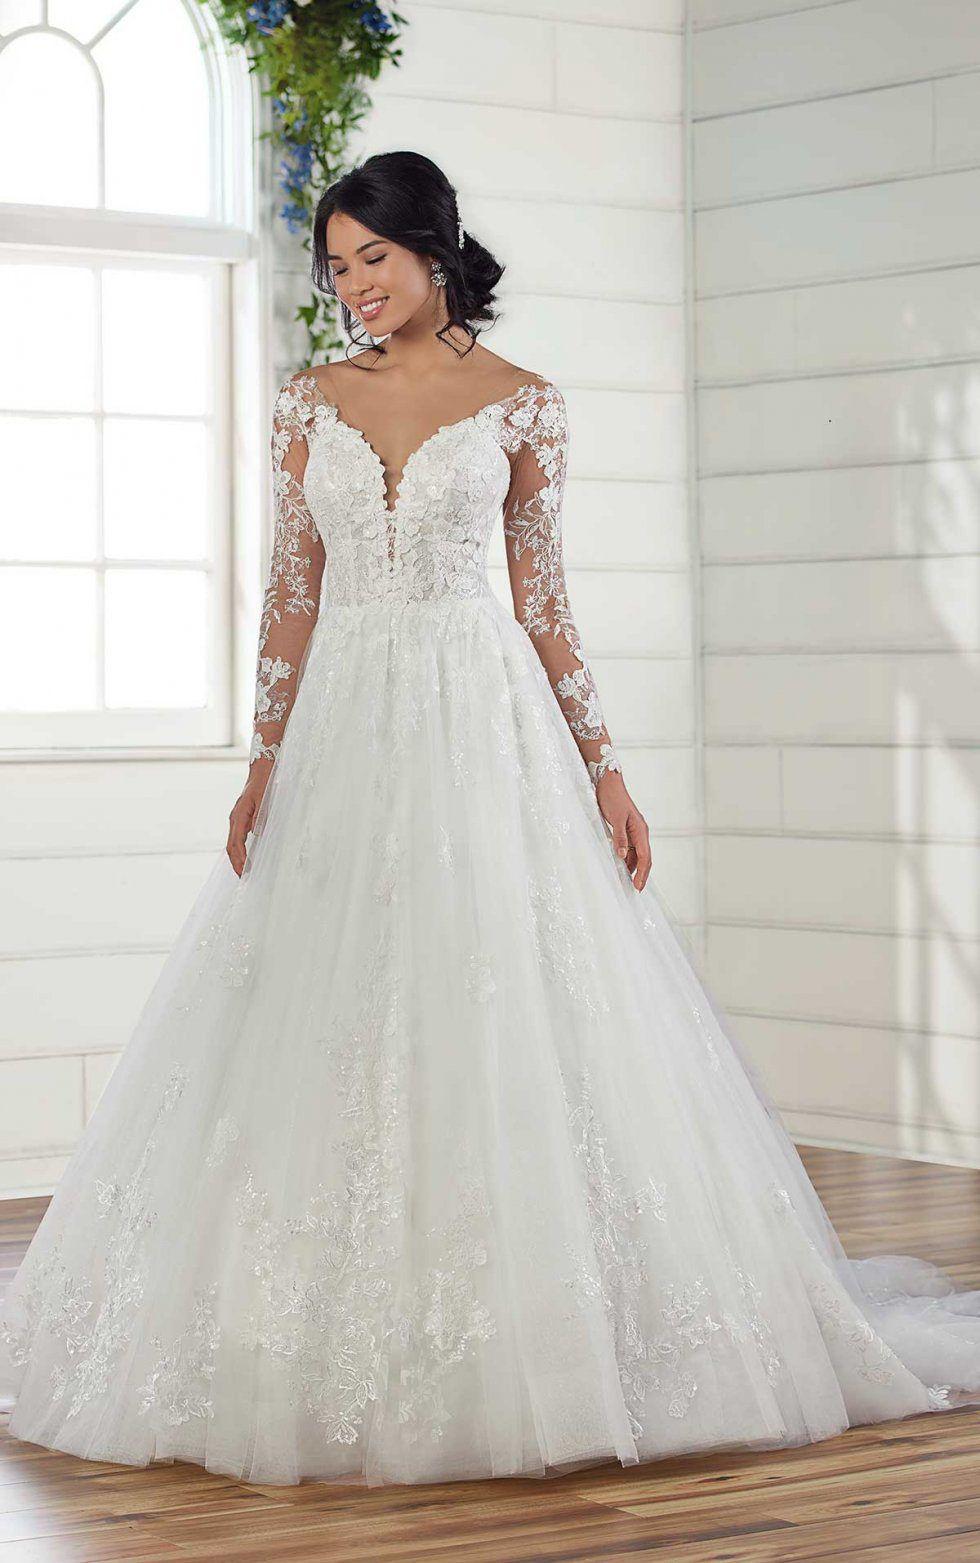 Wedding Dress Style D2939 Essense Of Australia Wedding Dresses Lace Ballgown Lace Wedding Dress With Sleeves Long Sleeve Wedding Dress Lace [ 1563 x 980 Pixel ]